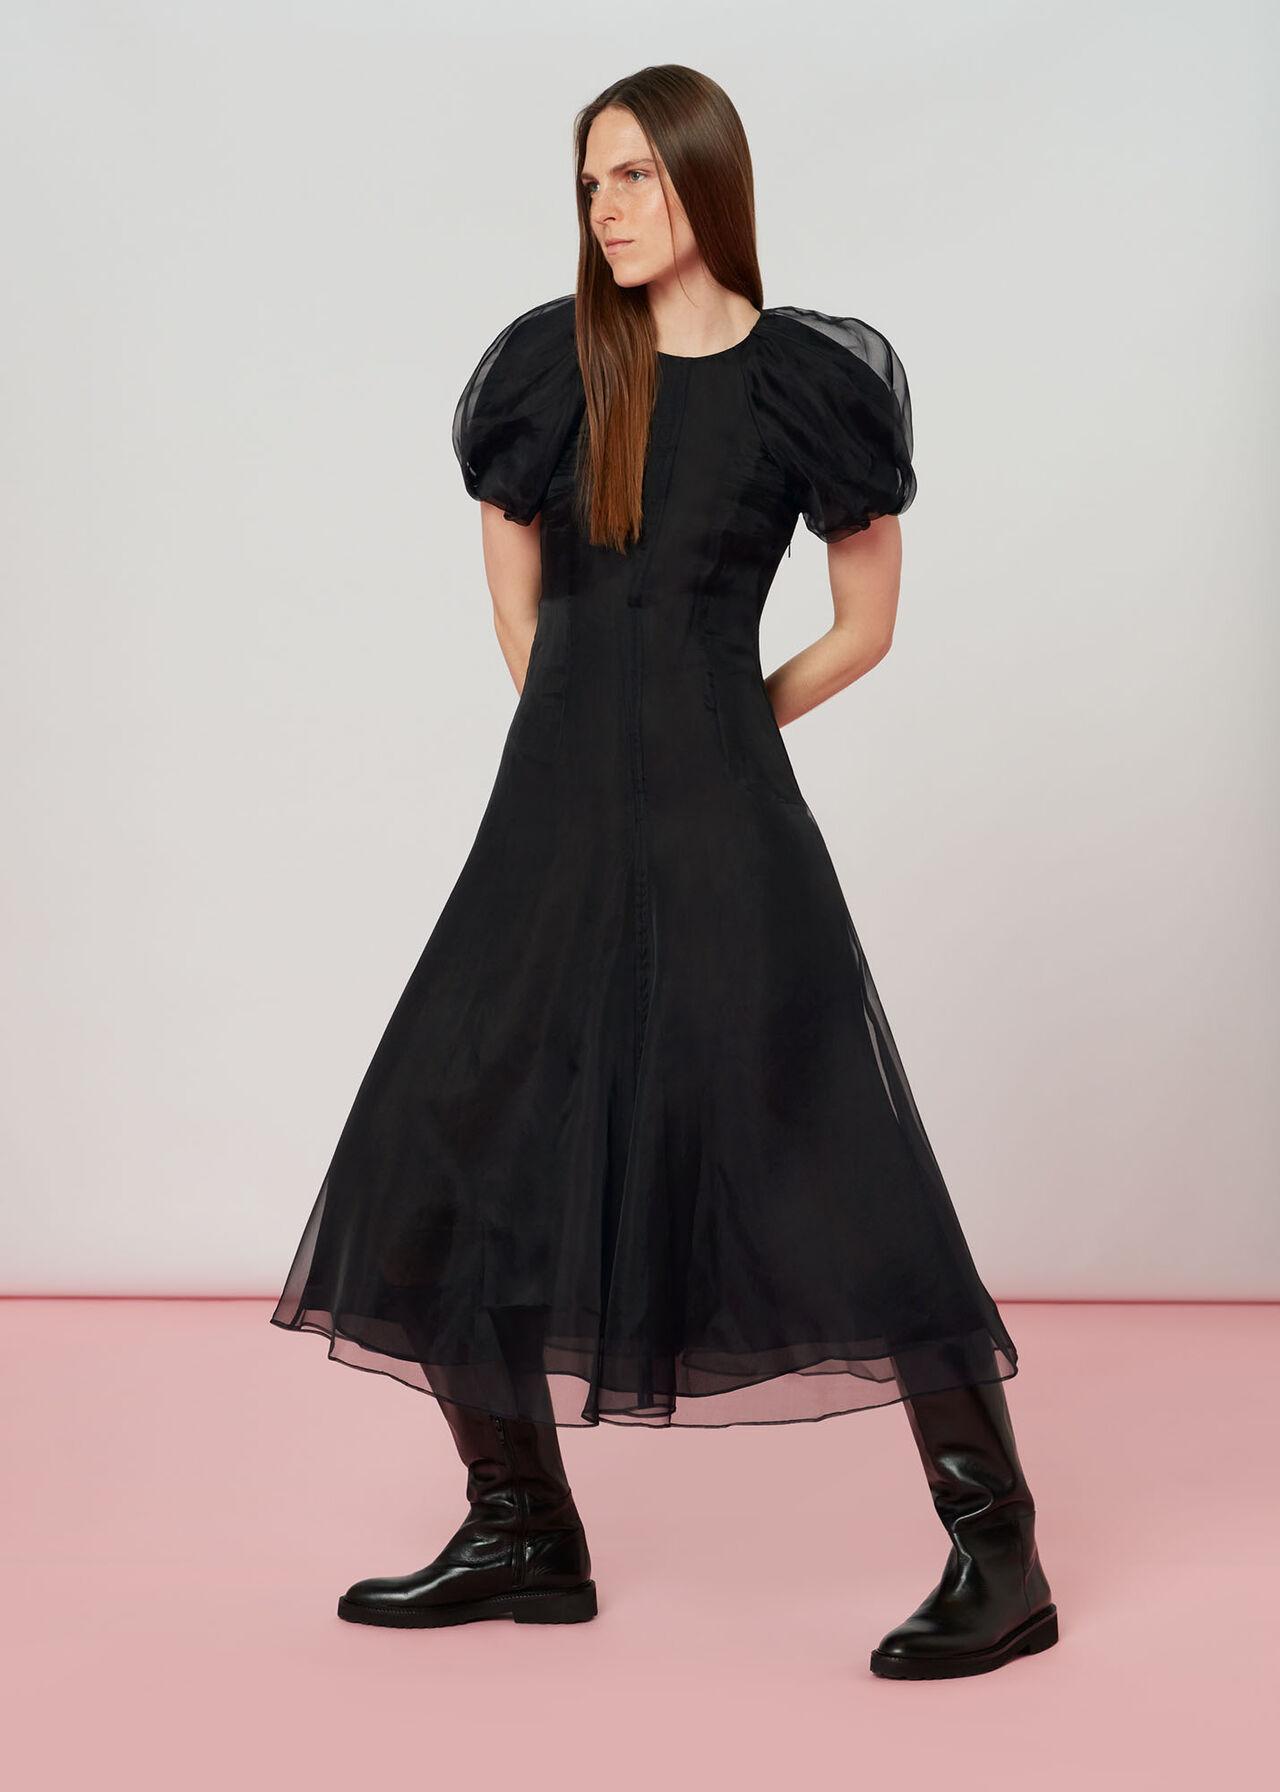 Organza Puff Sleeve Dress